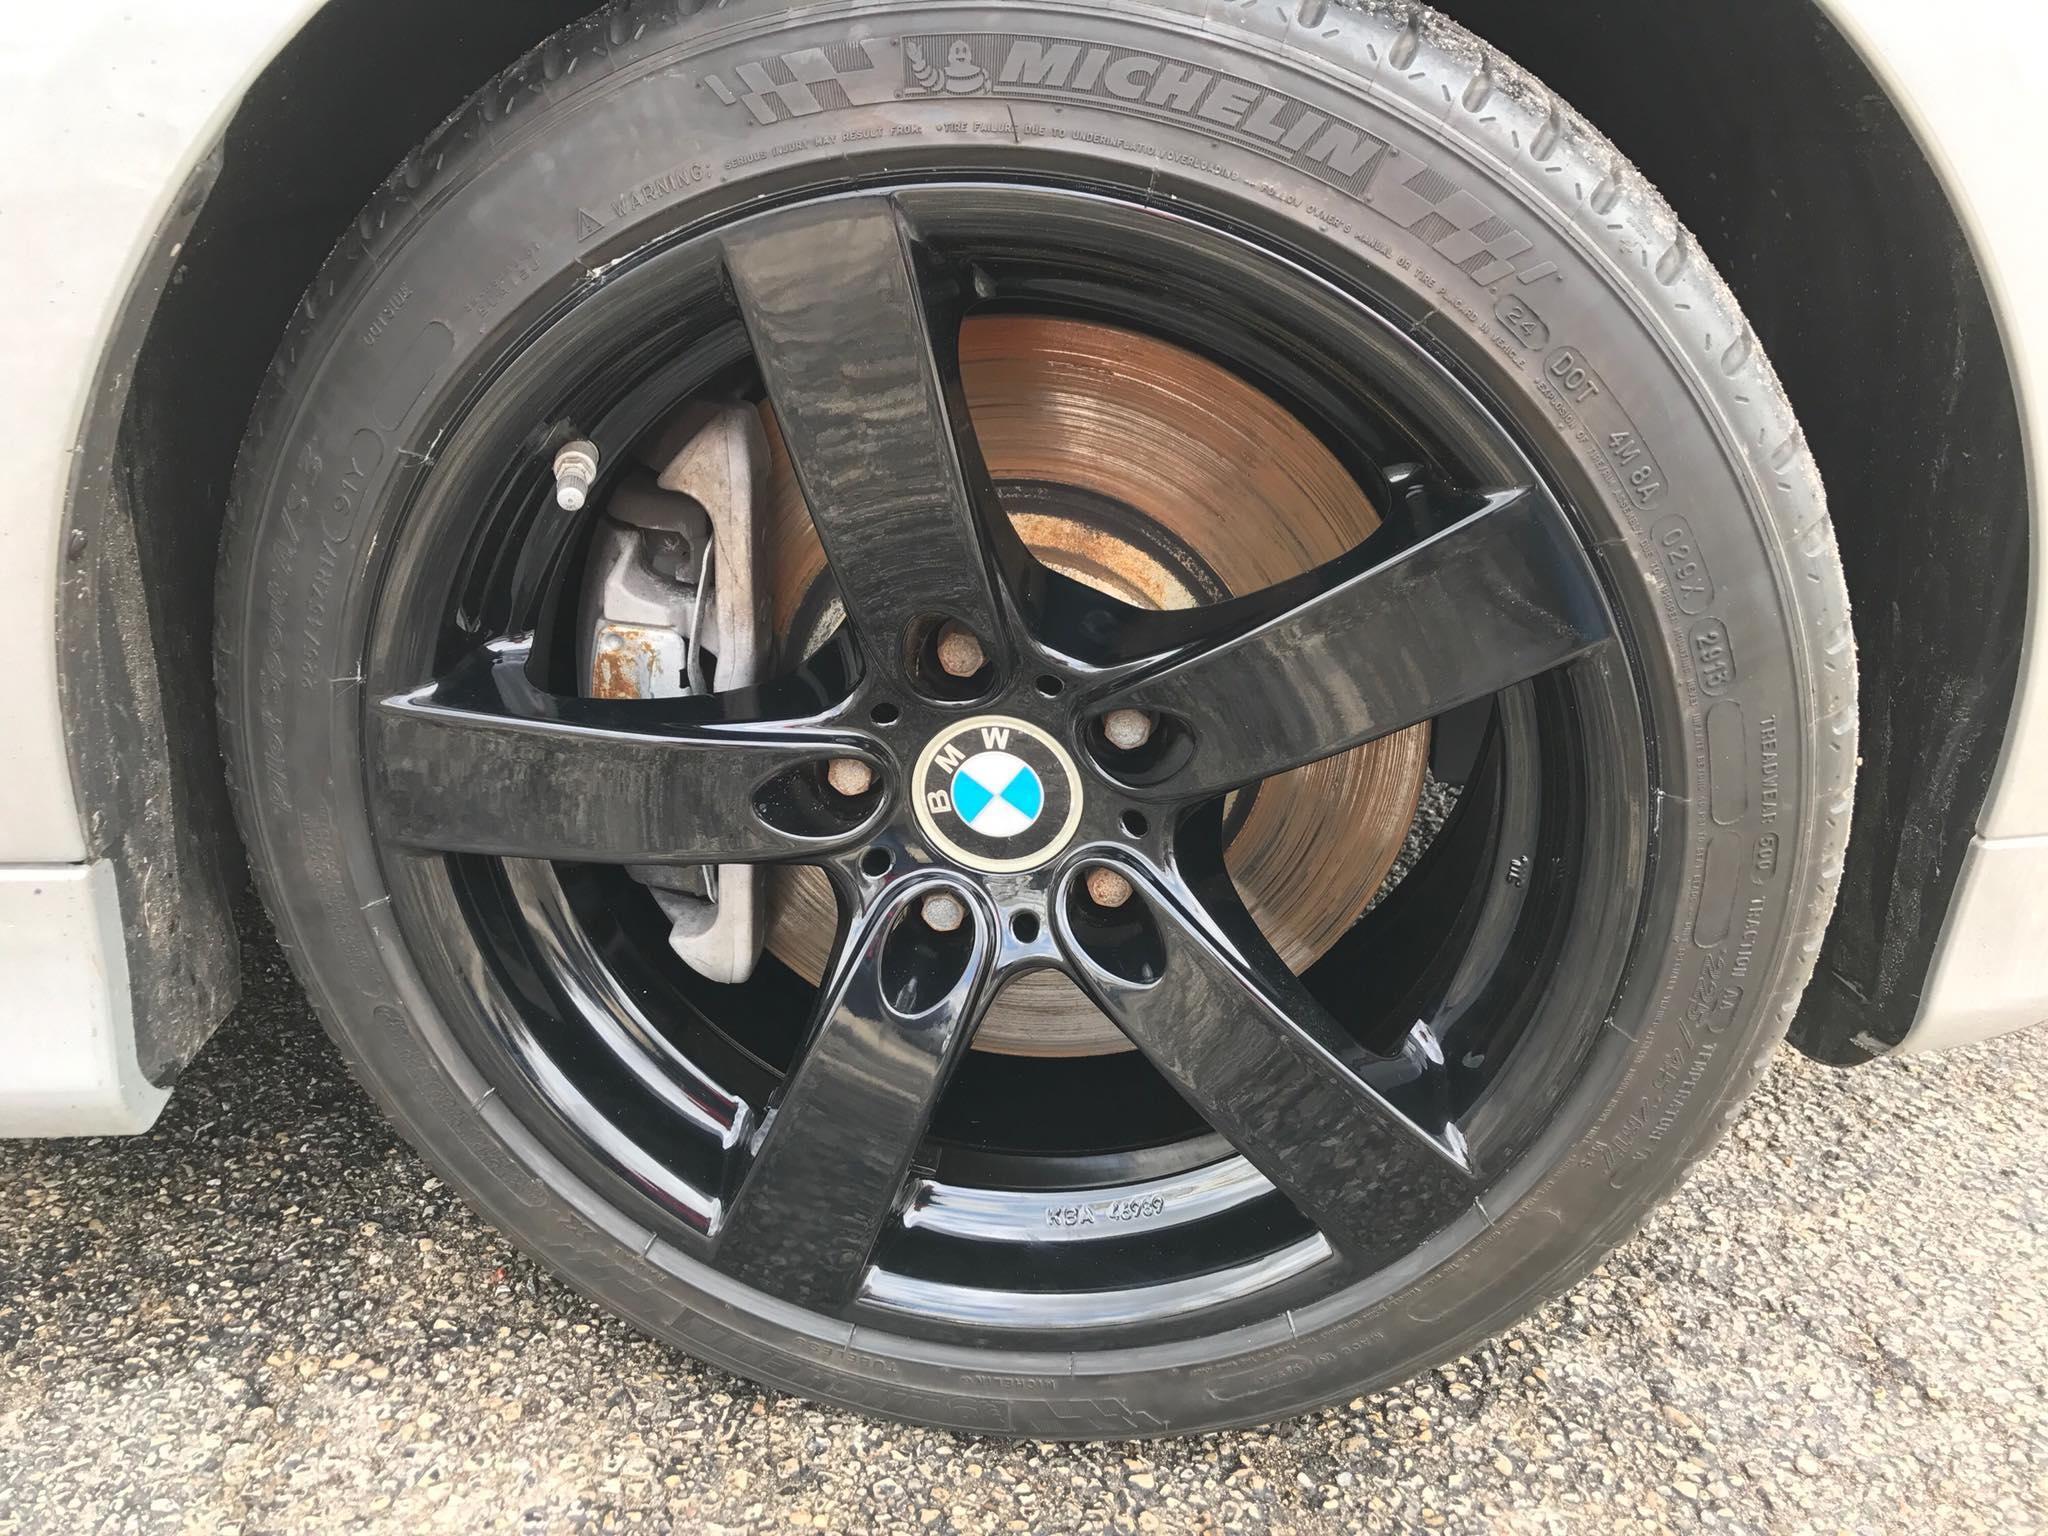 Tristate Rim & Wheel image 36